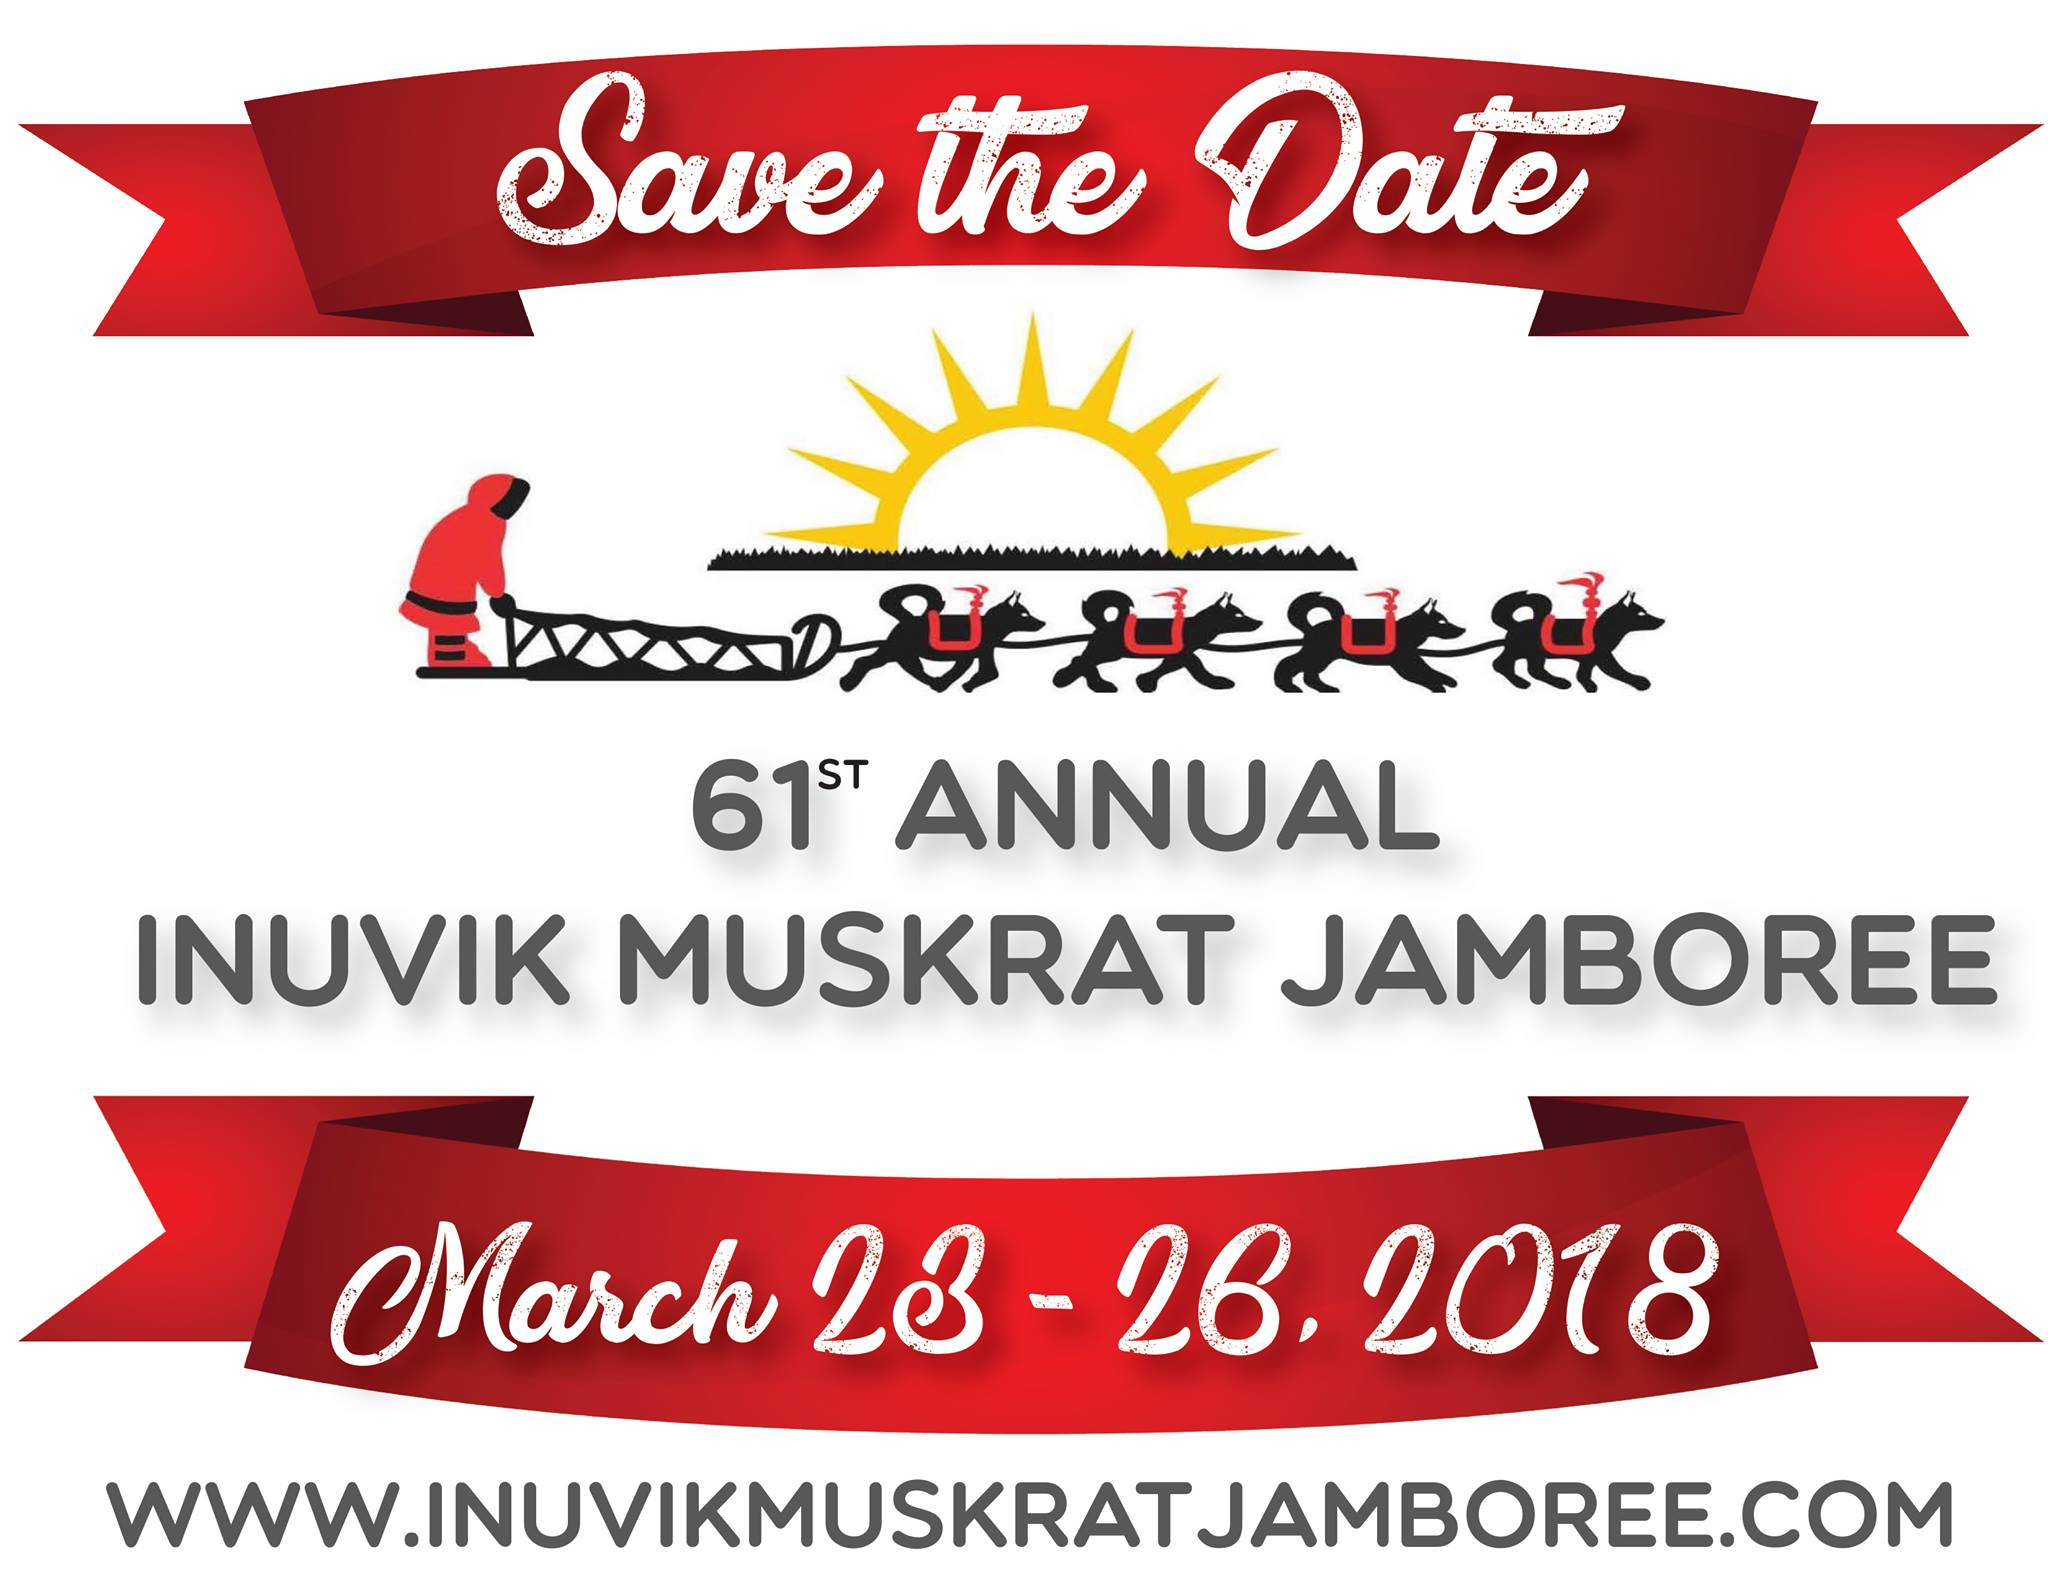 61st Annual Inuvik Muskrat Jamboree